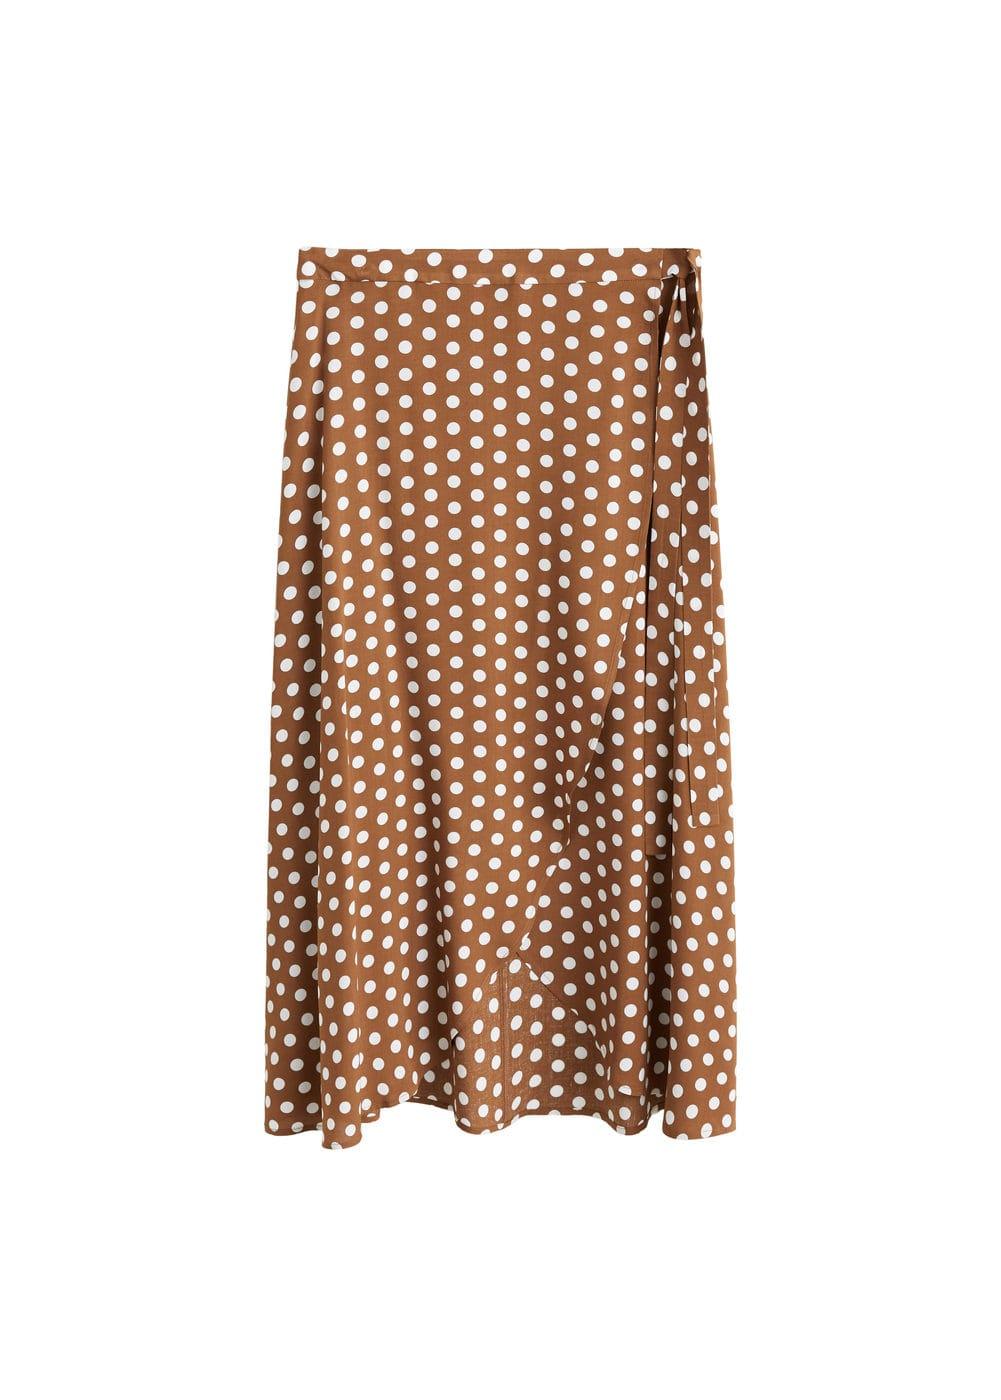 m-mire:falda cruzada estampada